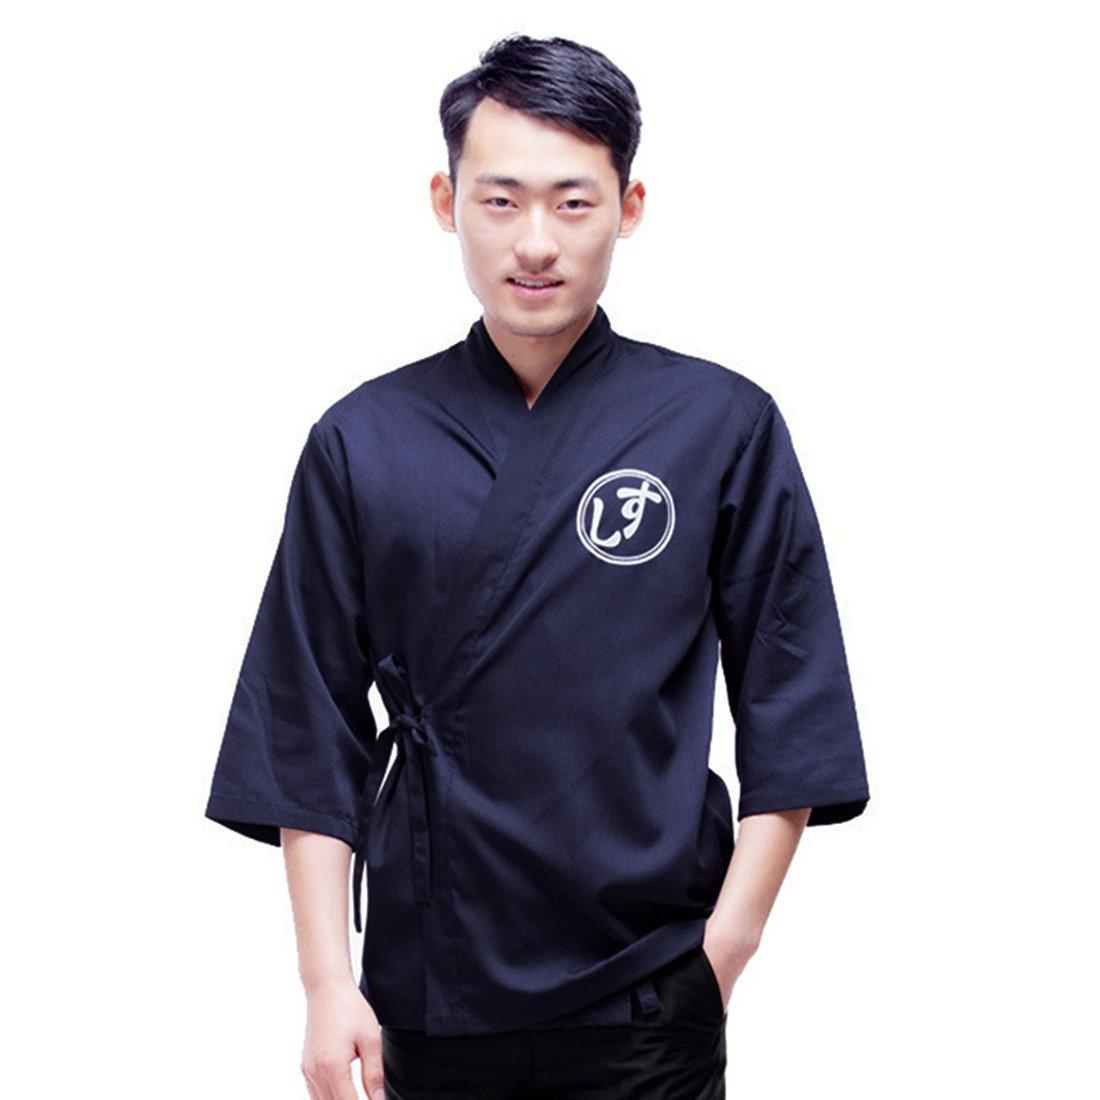 Pinji Japanese Style Chef Coat Jacket for Men Women Workwear Sushi Restaurant Catering Uniform Work Clothes Kitchen Asian 2XL